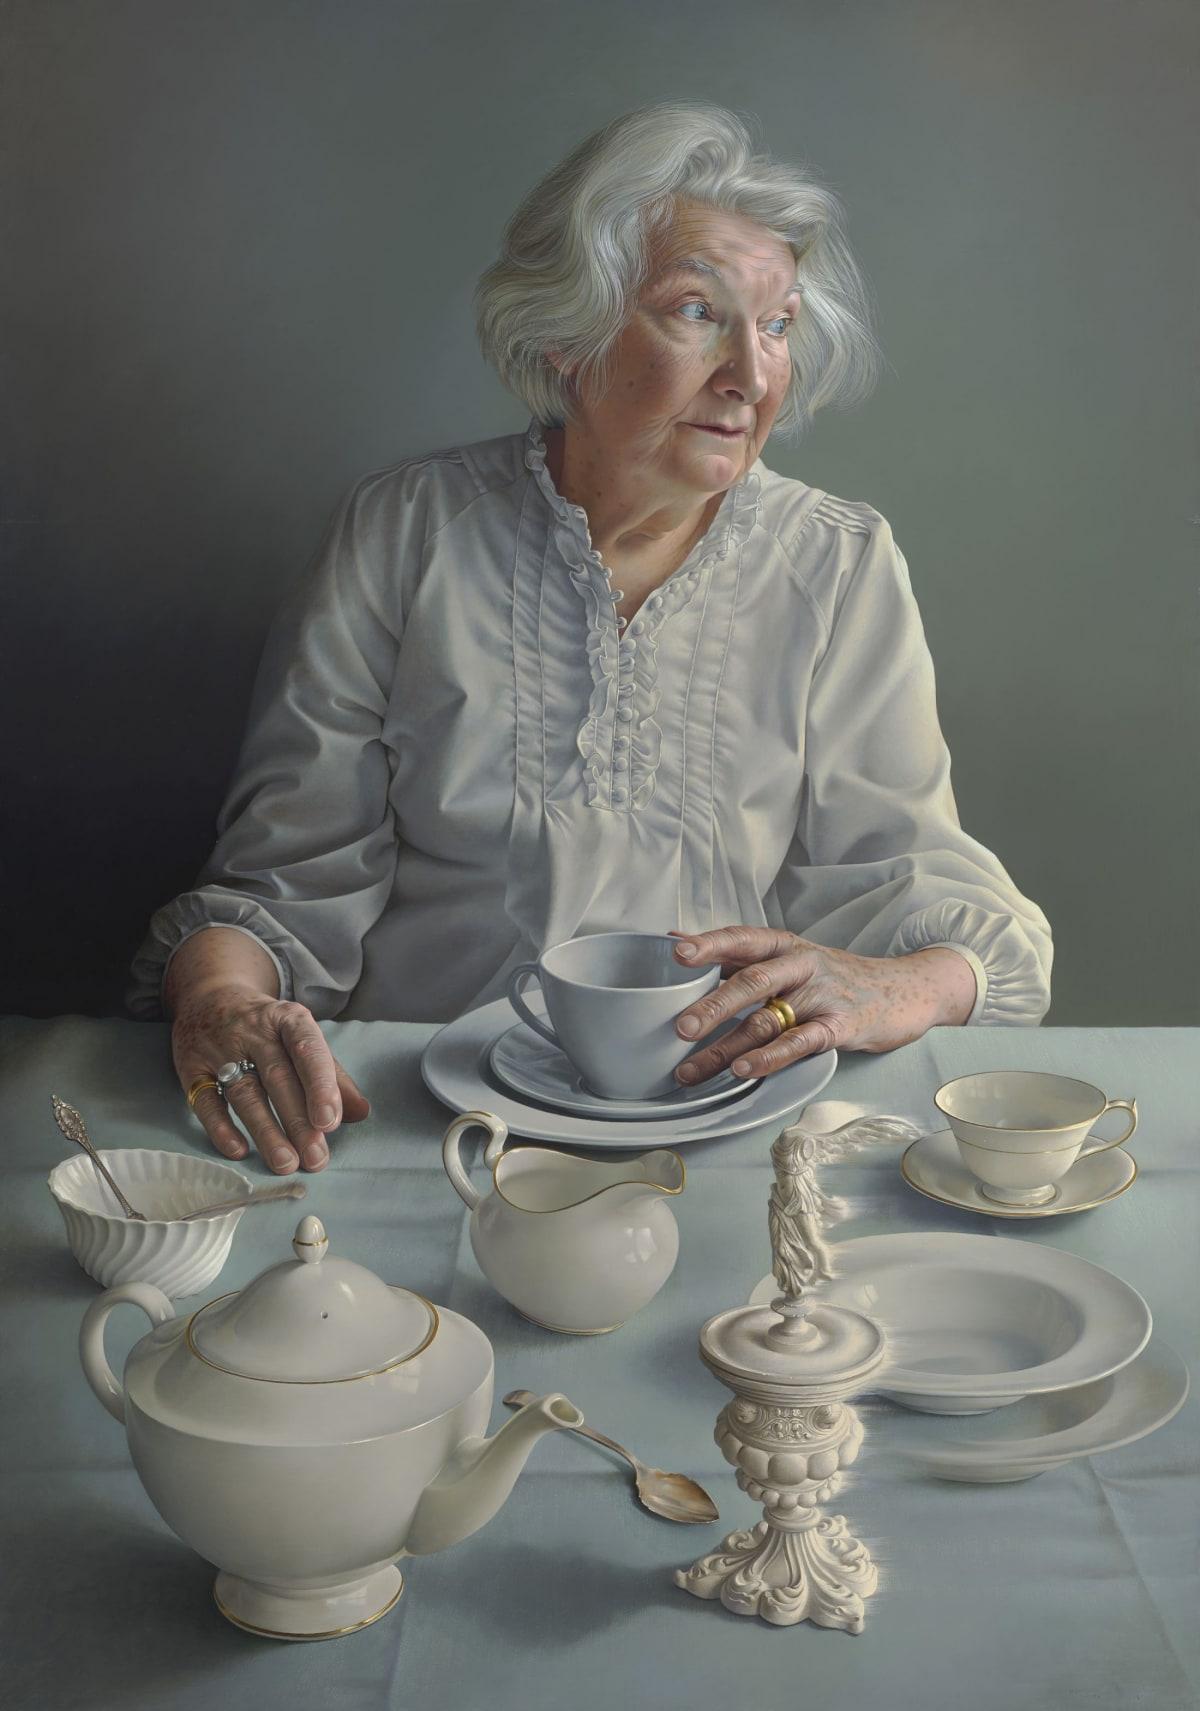 Miriam Escofet wins BP Portrait Award 2018